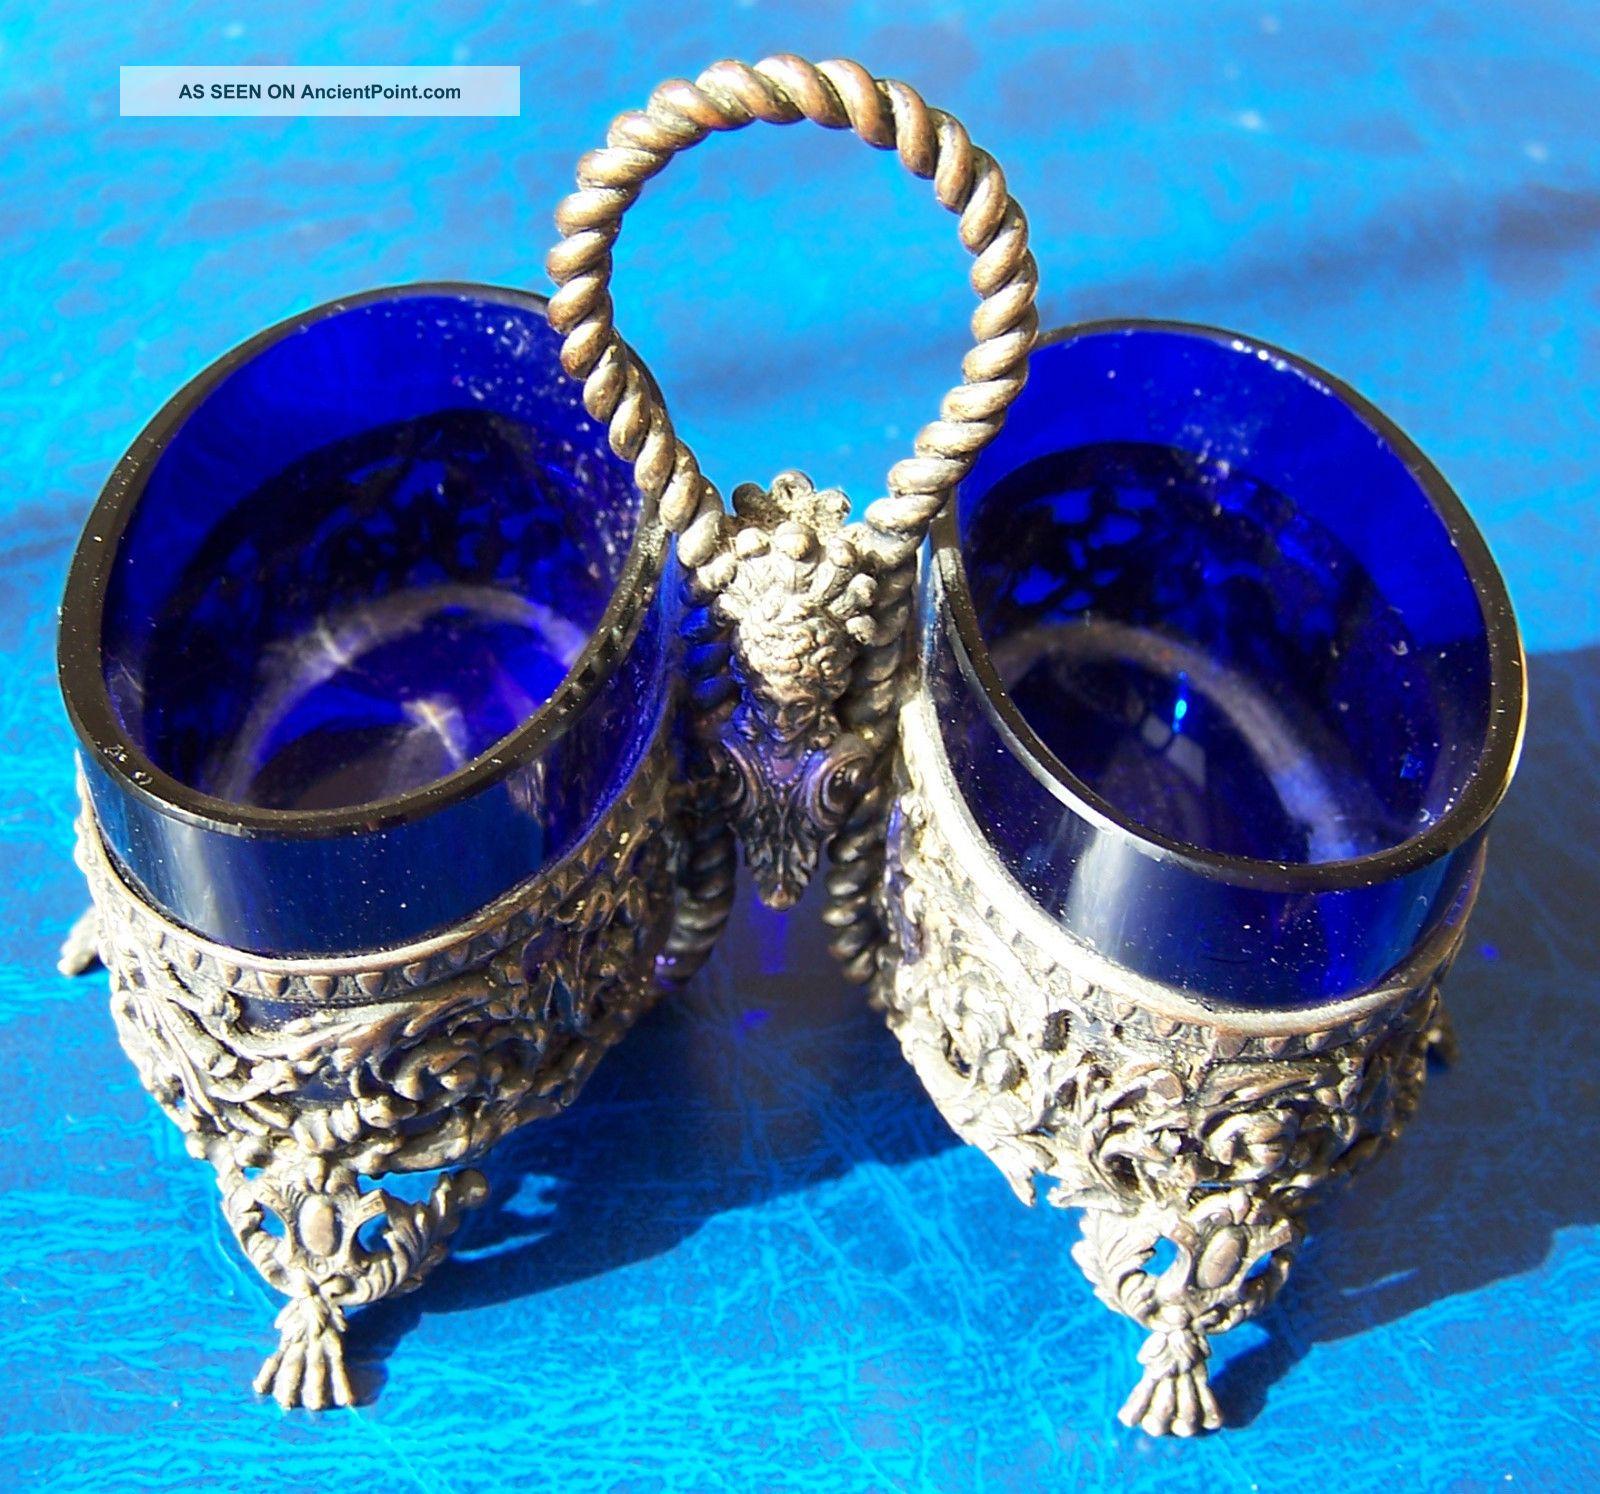 Vintage French Mon Girardin Silver Plated Salt Cellars Cobalt Blue Liners In Vgc Salt & Pepper Cellars/ Shakers photo